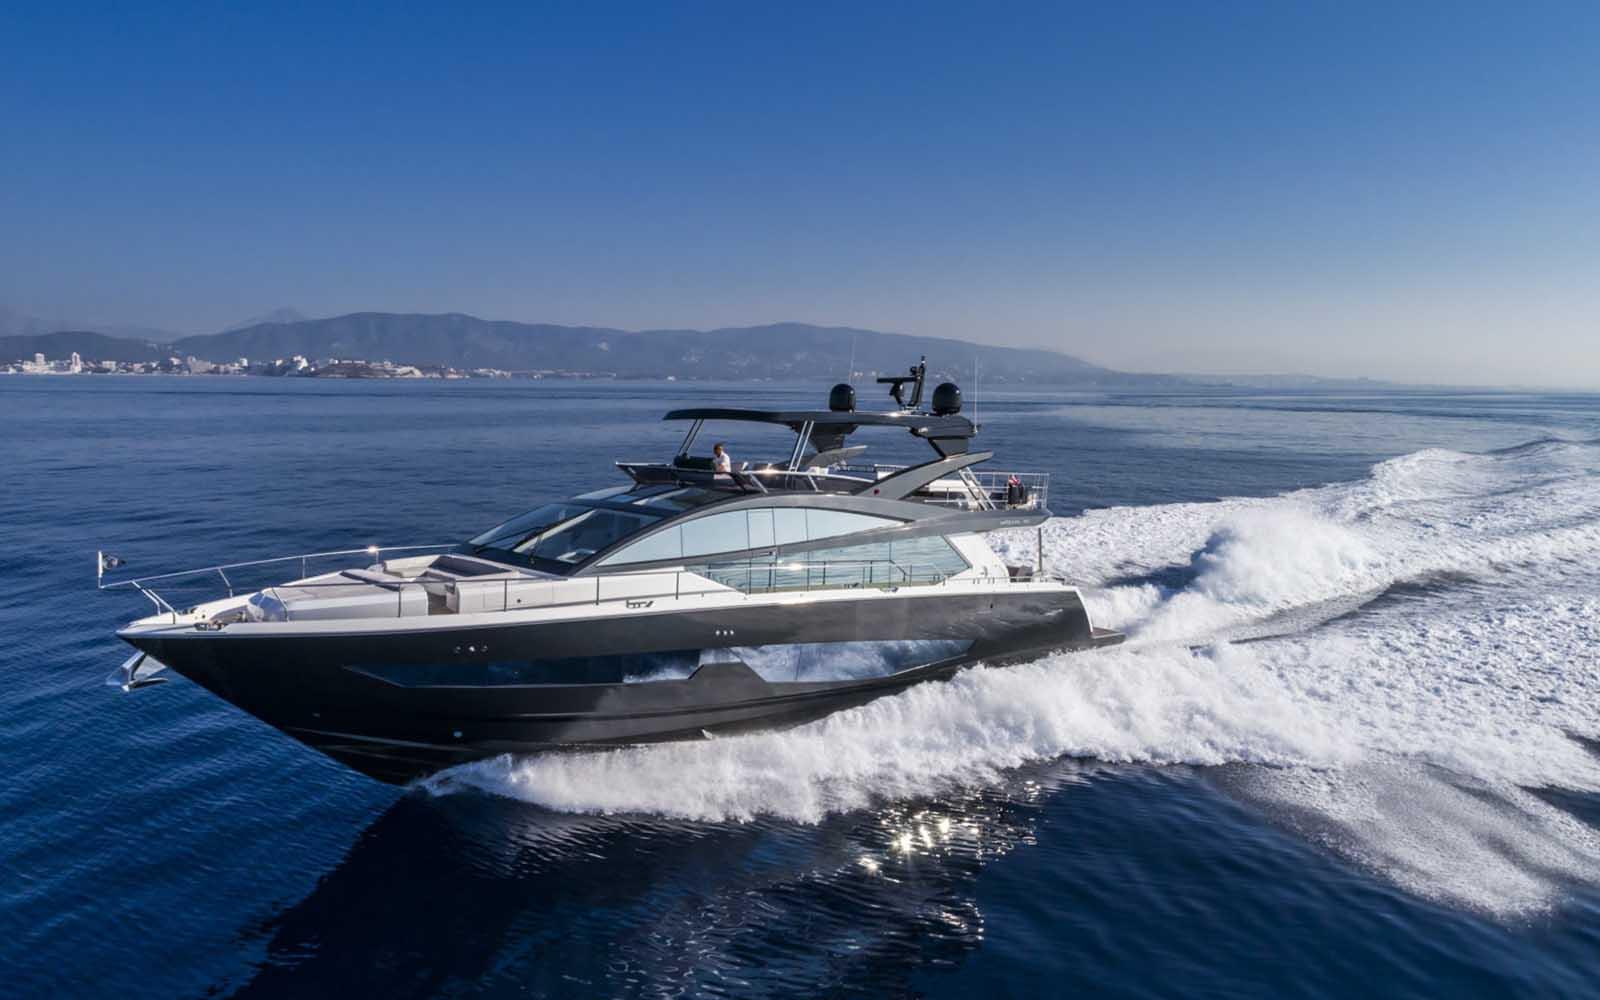 motor boat award - boat shopping